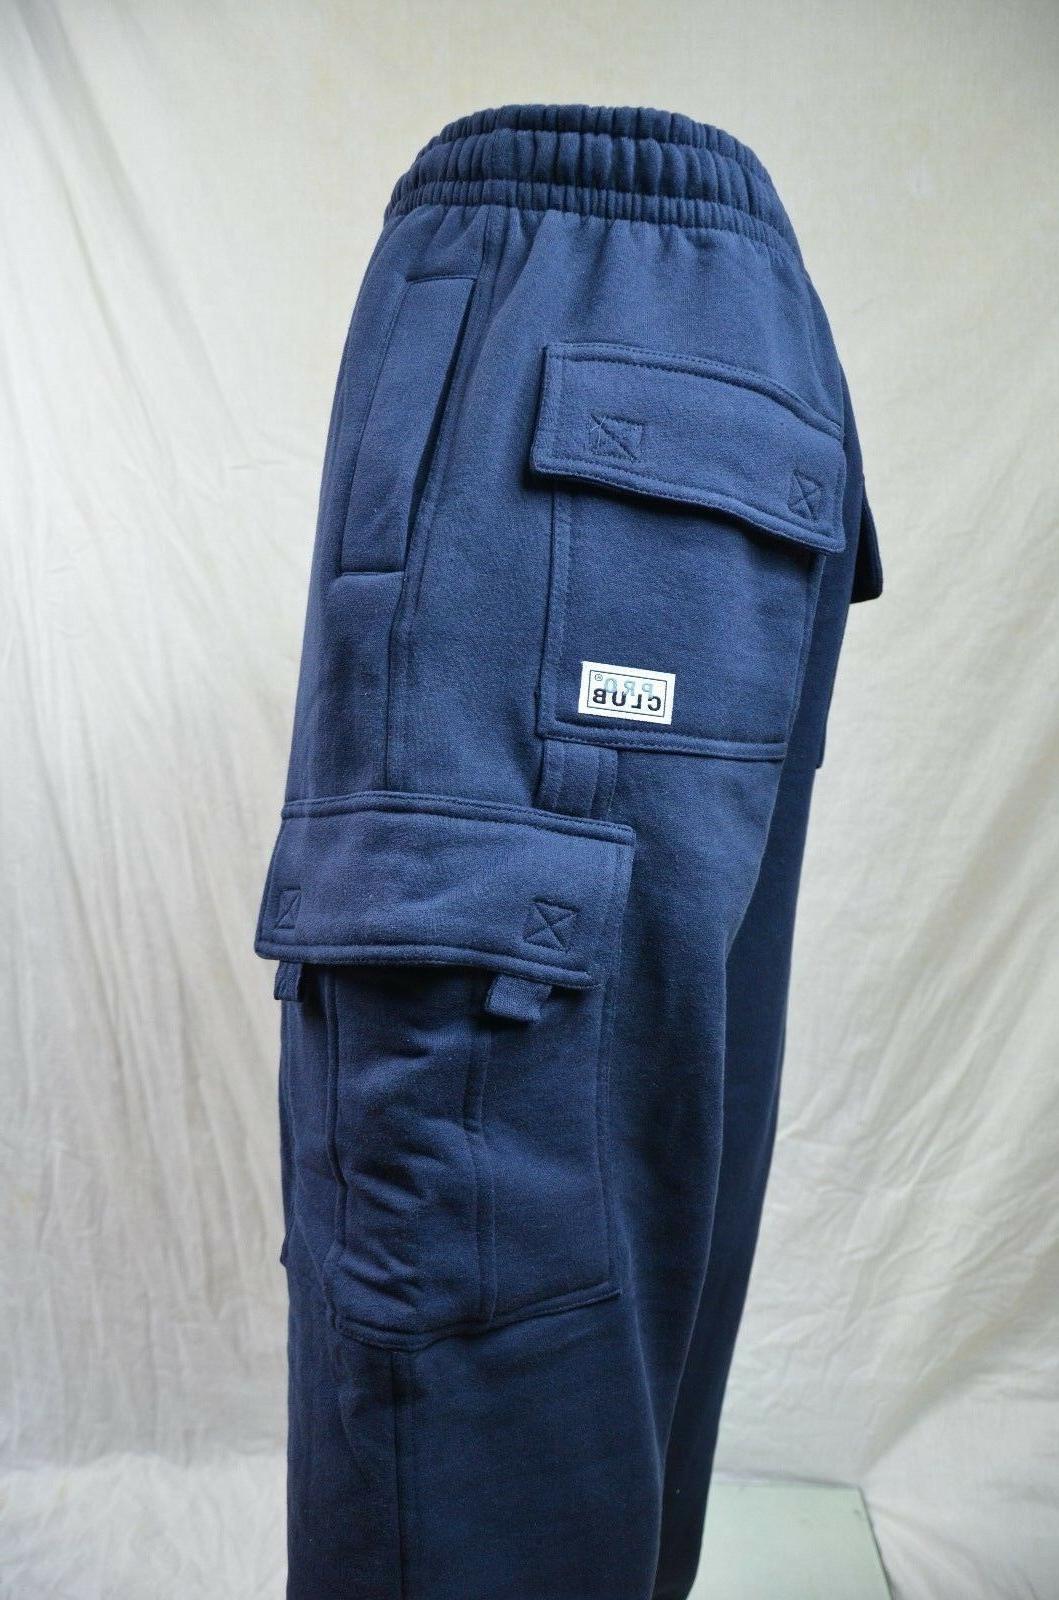 Pro Club Sweatpants Navy Weight